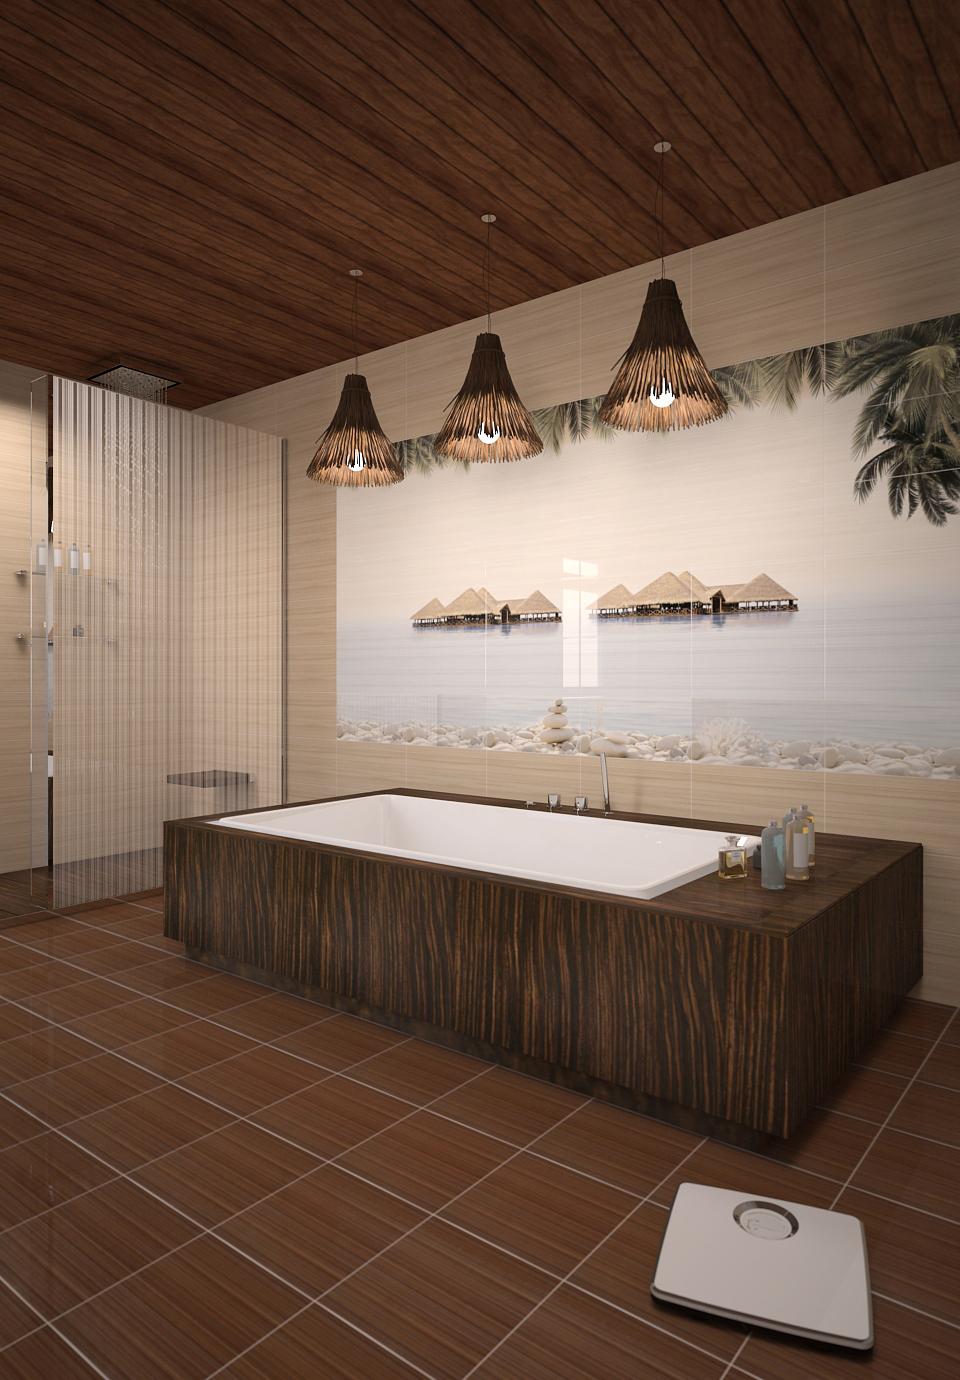 carrelage kazan beige ajaccio strasbourg pessac prix renovation electricite maison. Black Bedroom Furniture Sets. Home Design Ideas